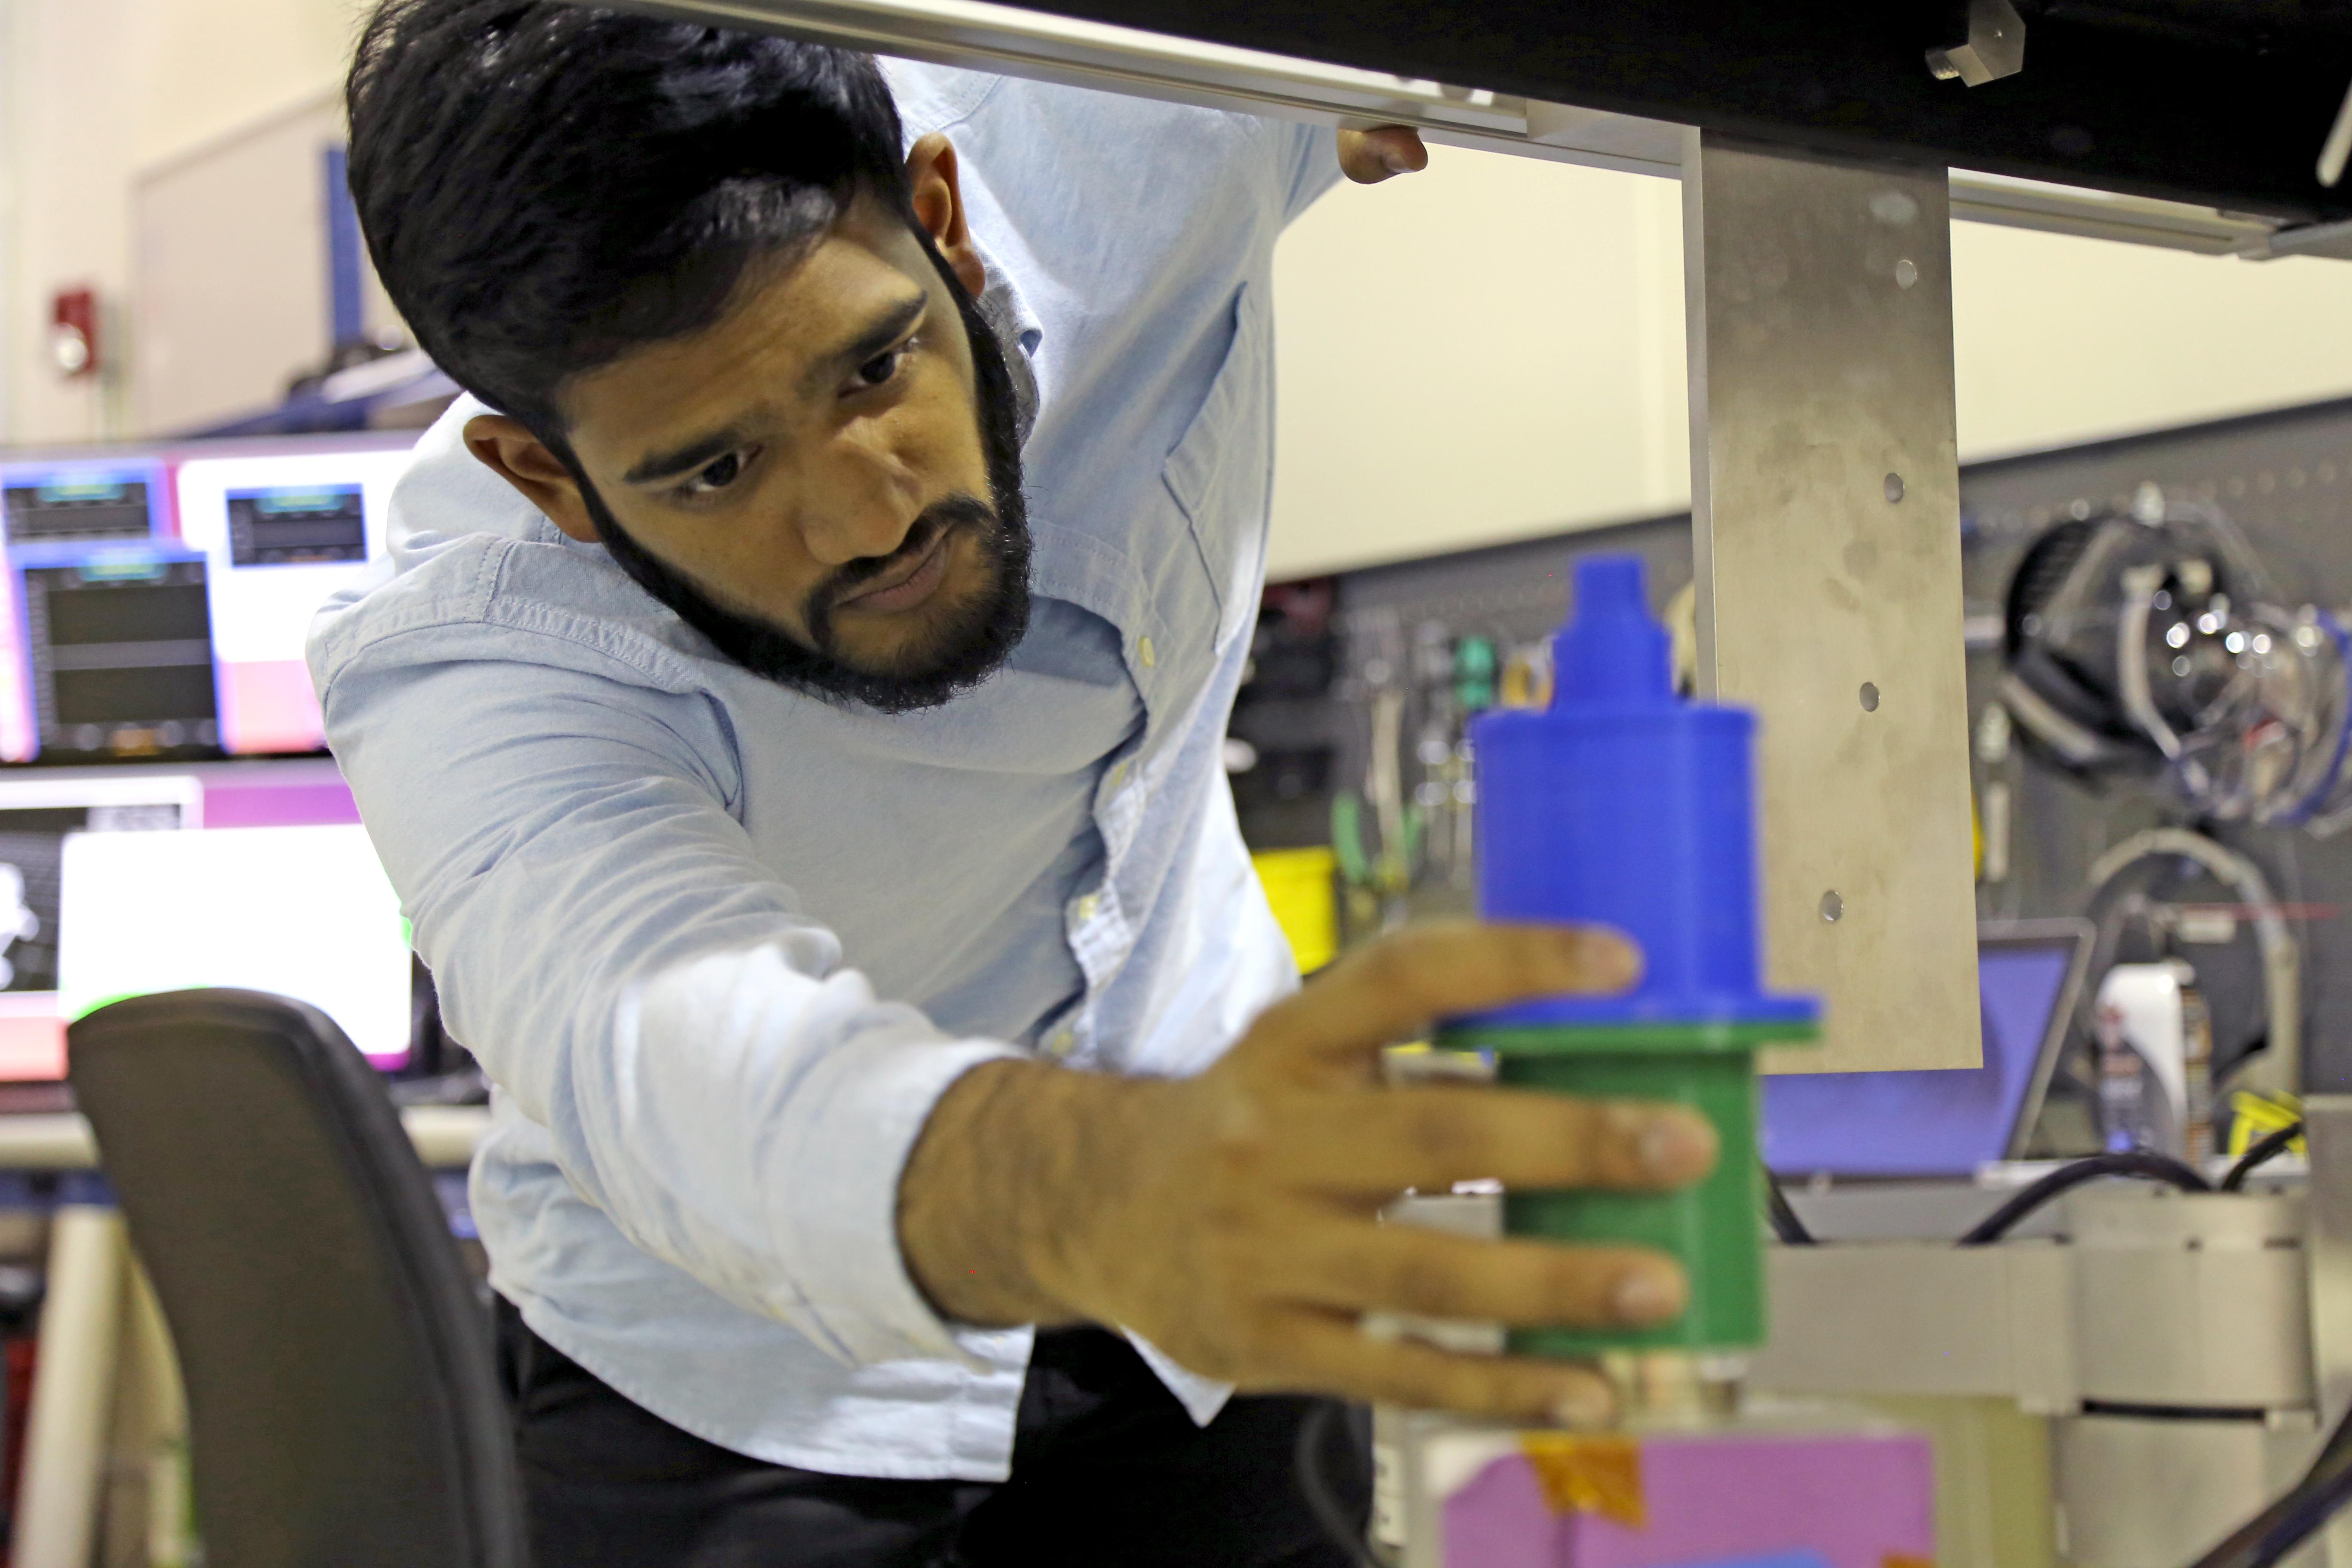 Nirmal Patel at NASA's Jet Propulsion Laboratory